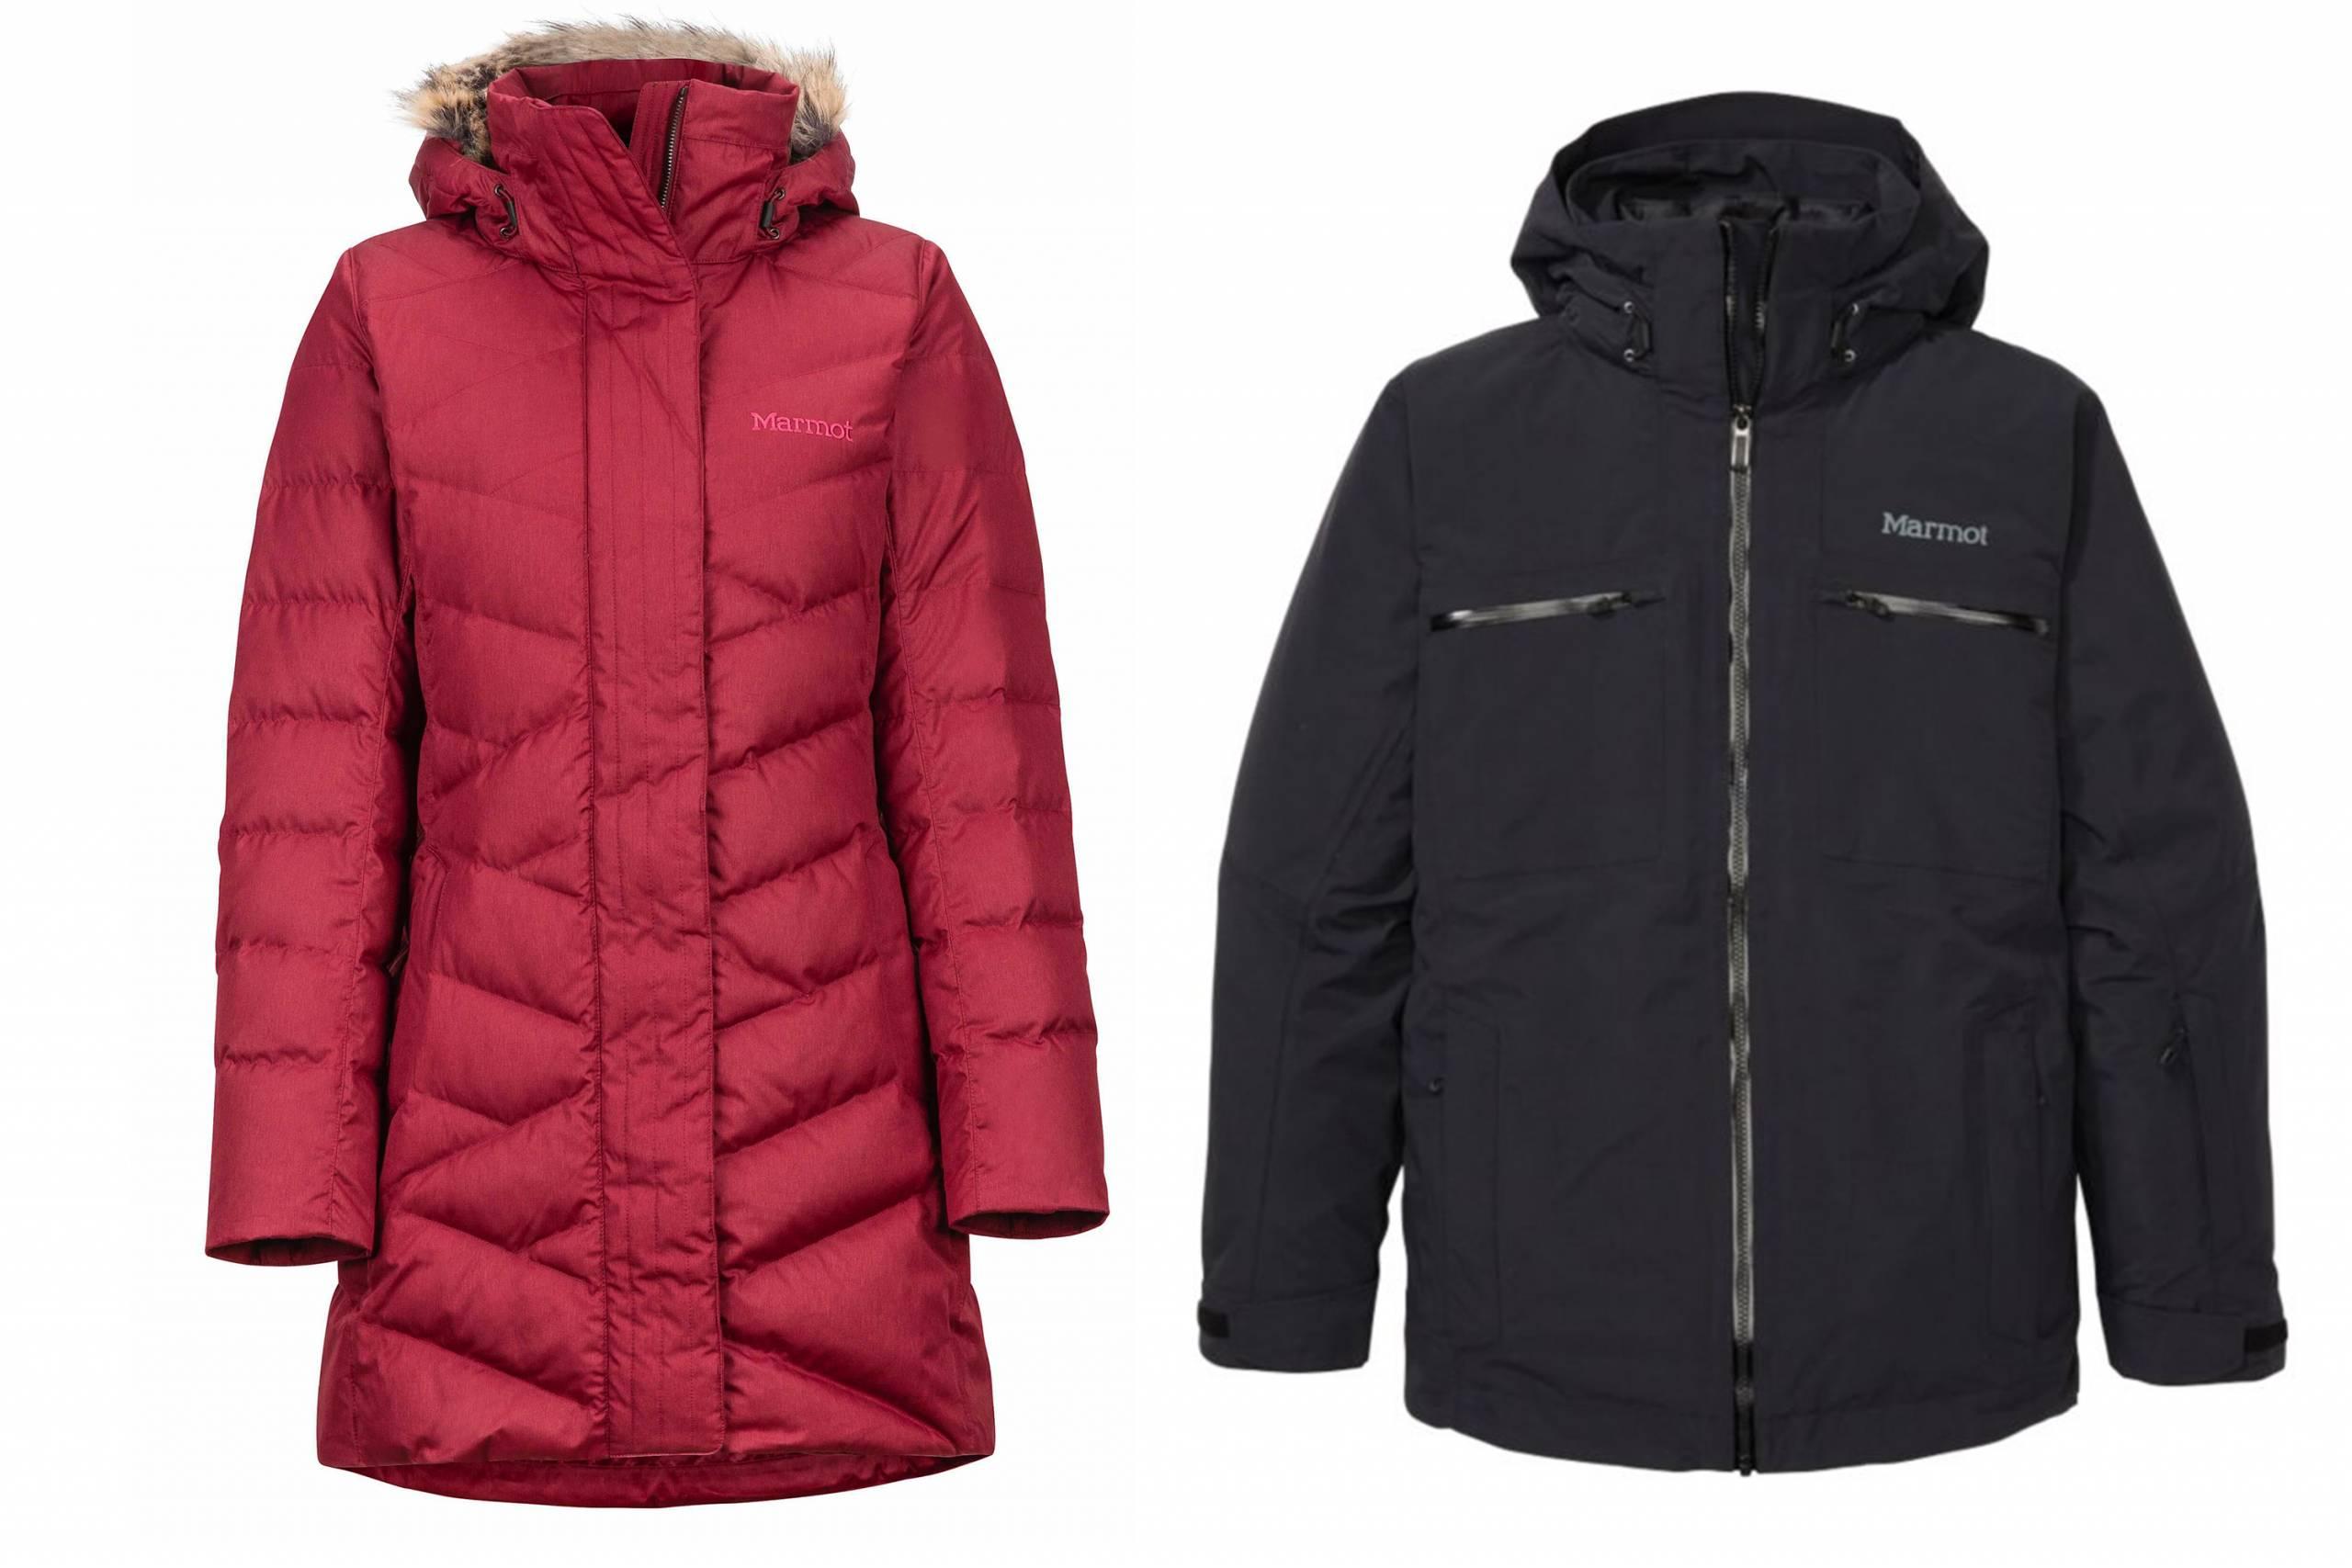 Marmot-Varma-Toro-winter-jackets